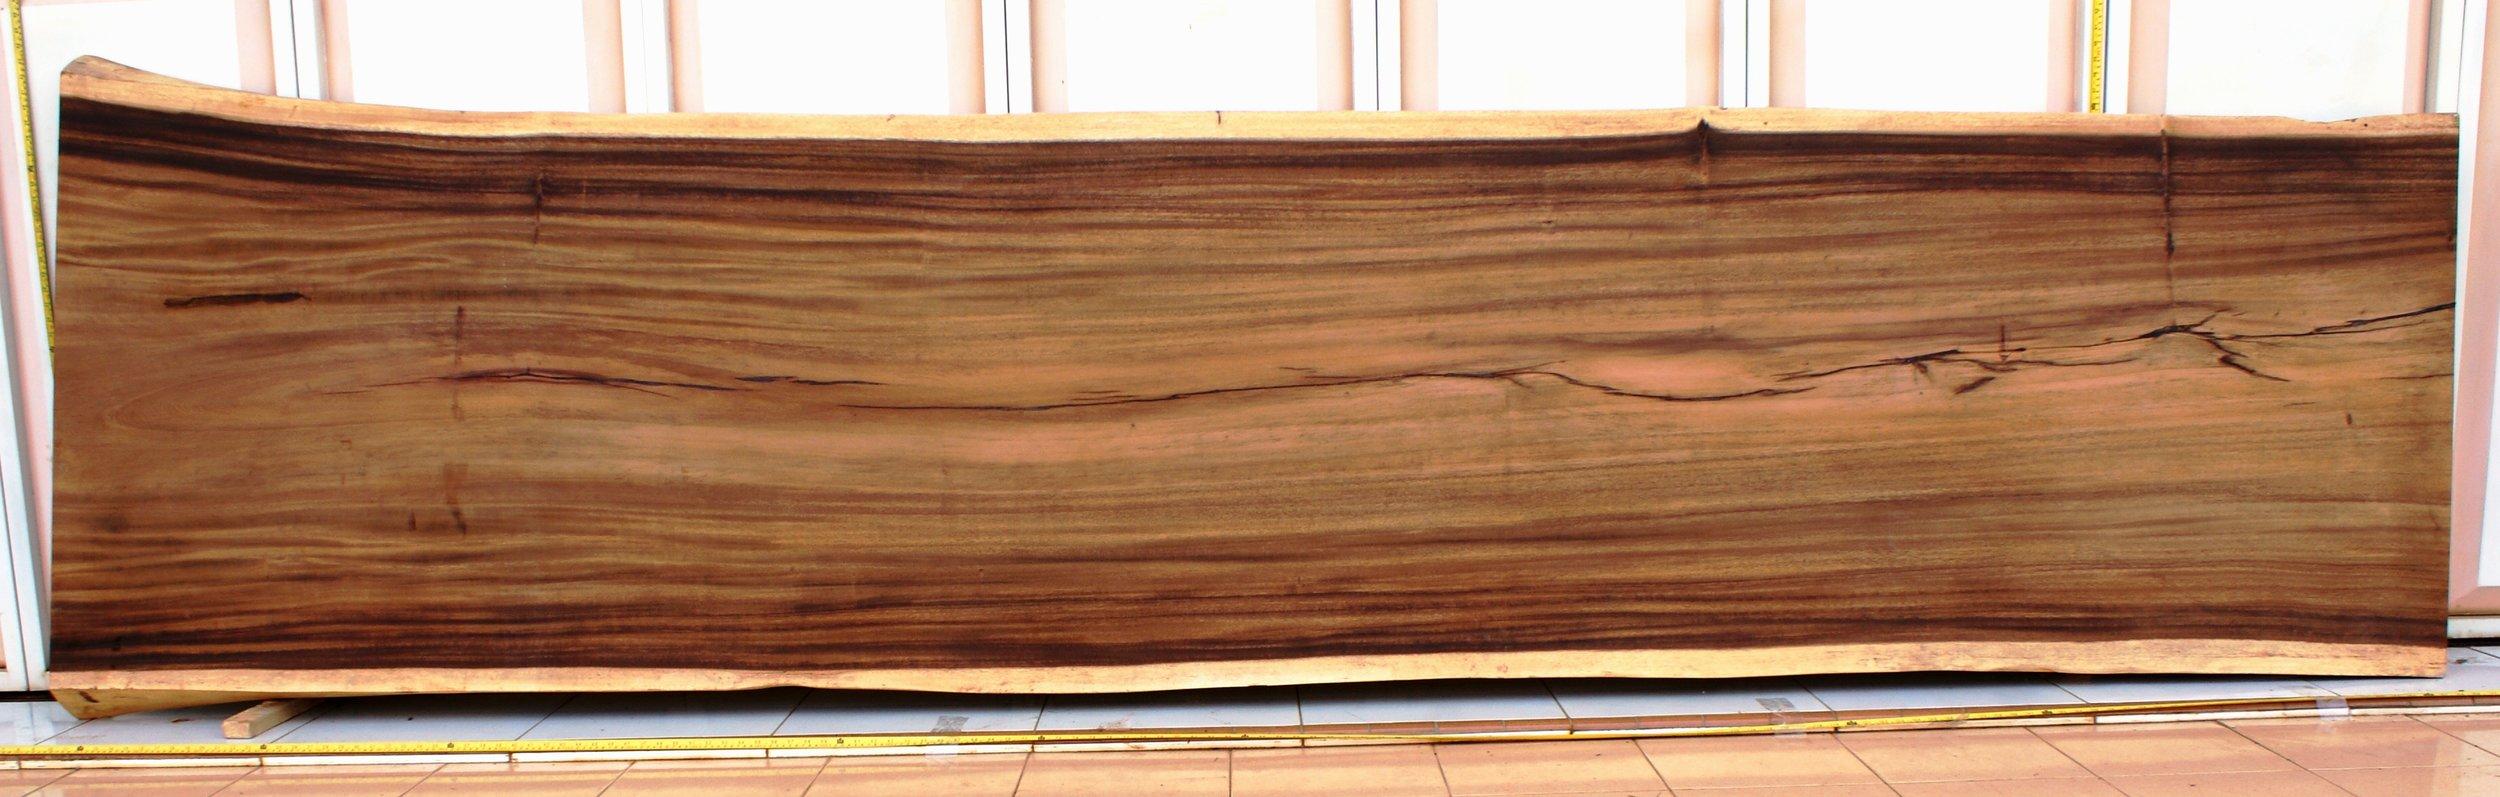 SUAR  Материал: слэб дерева  суар  Размеры: 400 x 97-110 х 10 см